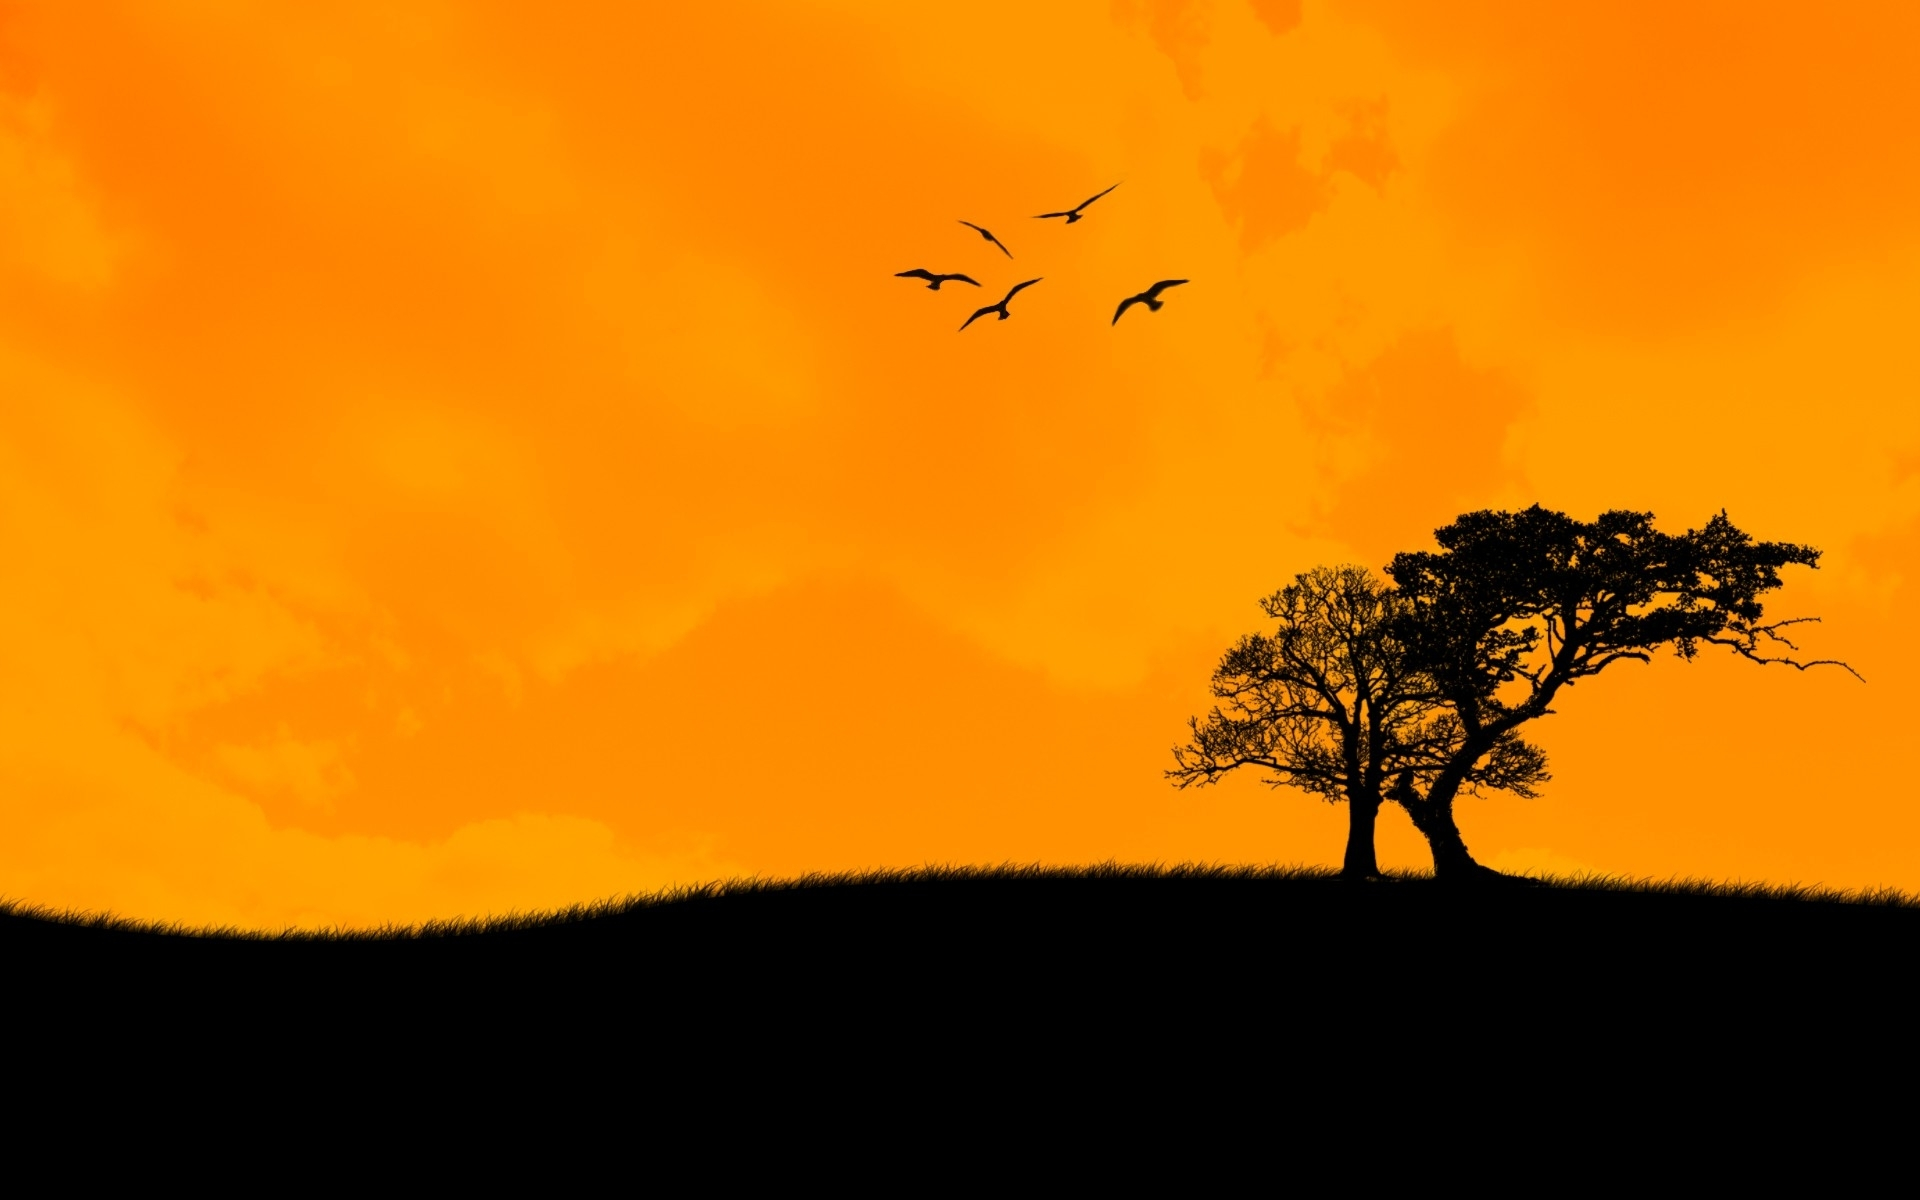 Sunset Trees Birds Wallpaper Anime Wallpaper Background Photo 1920x1200